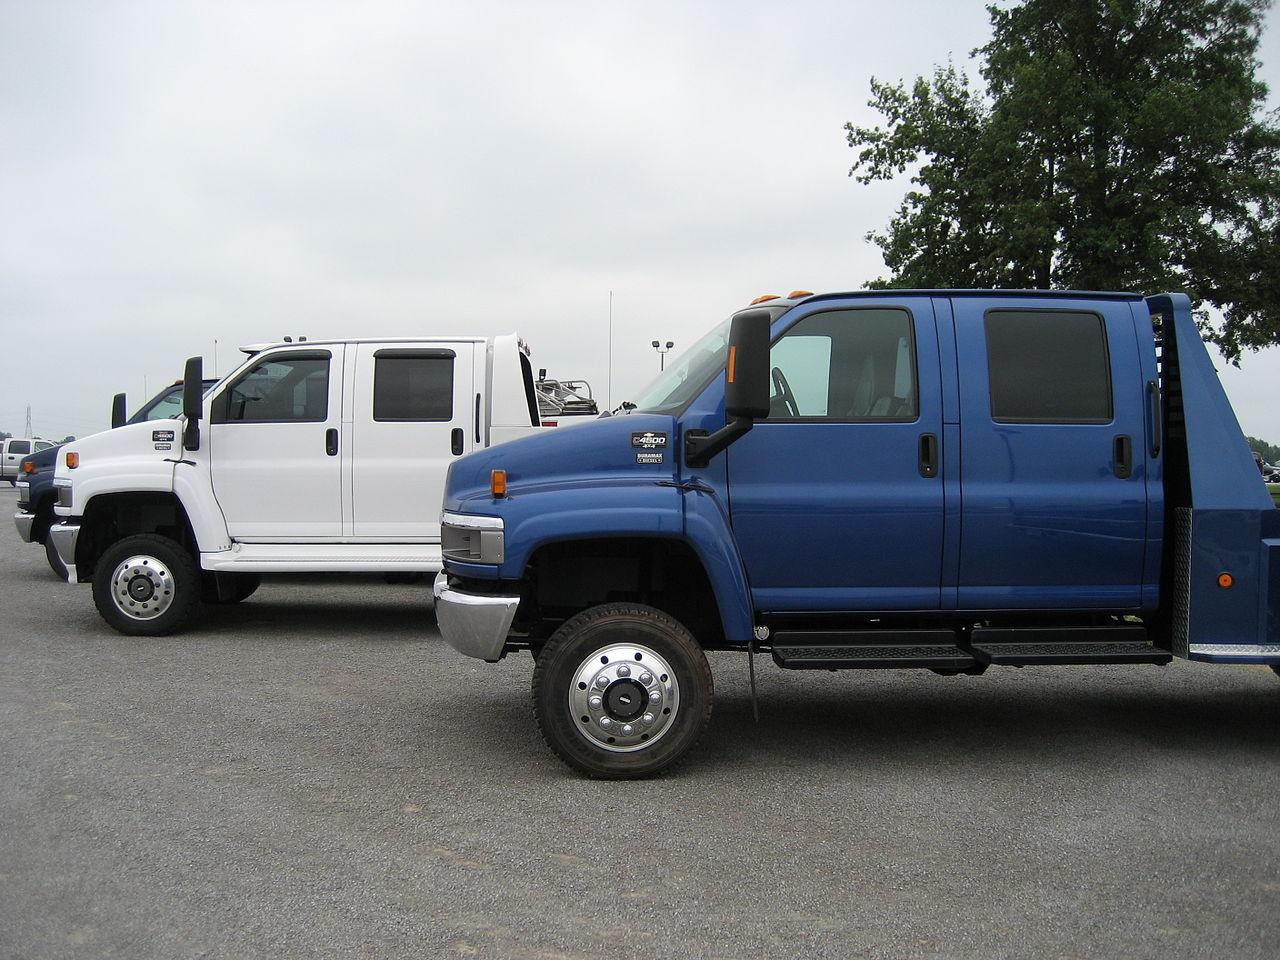 file:c4500 gm 4x4 medium duty trucks jpg